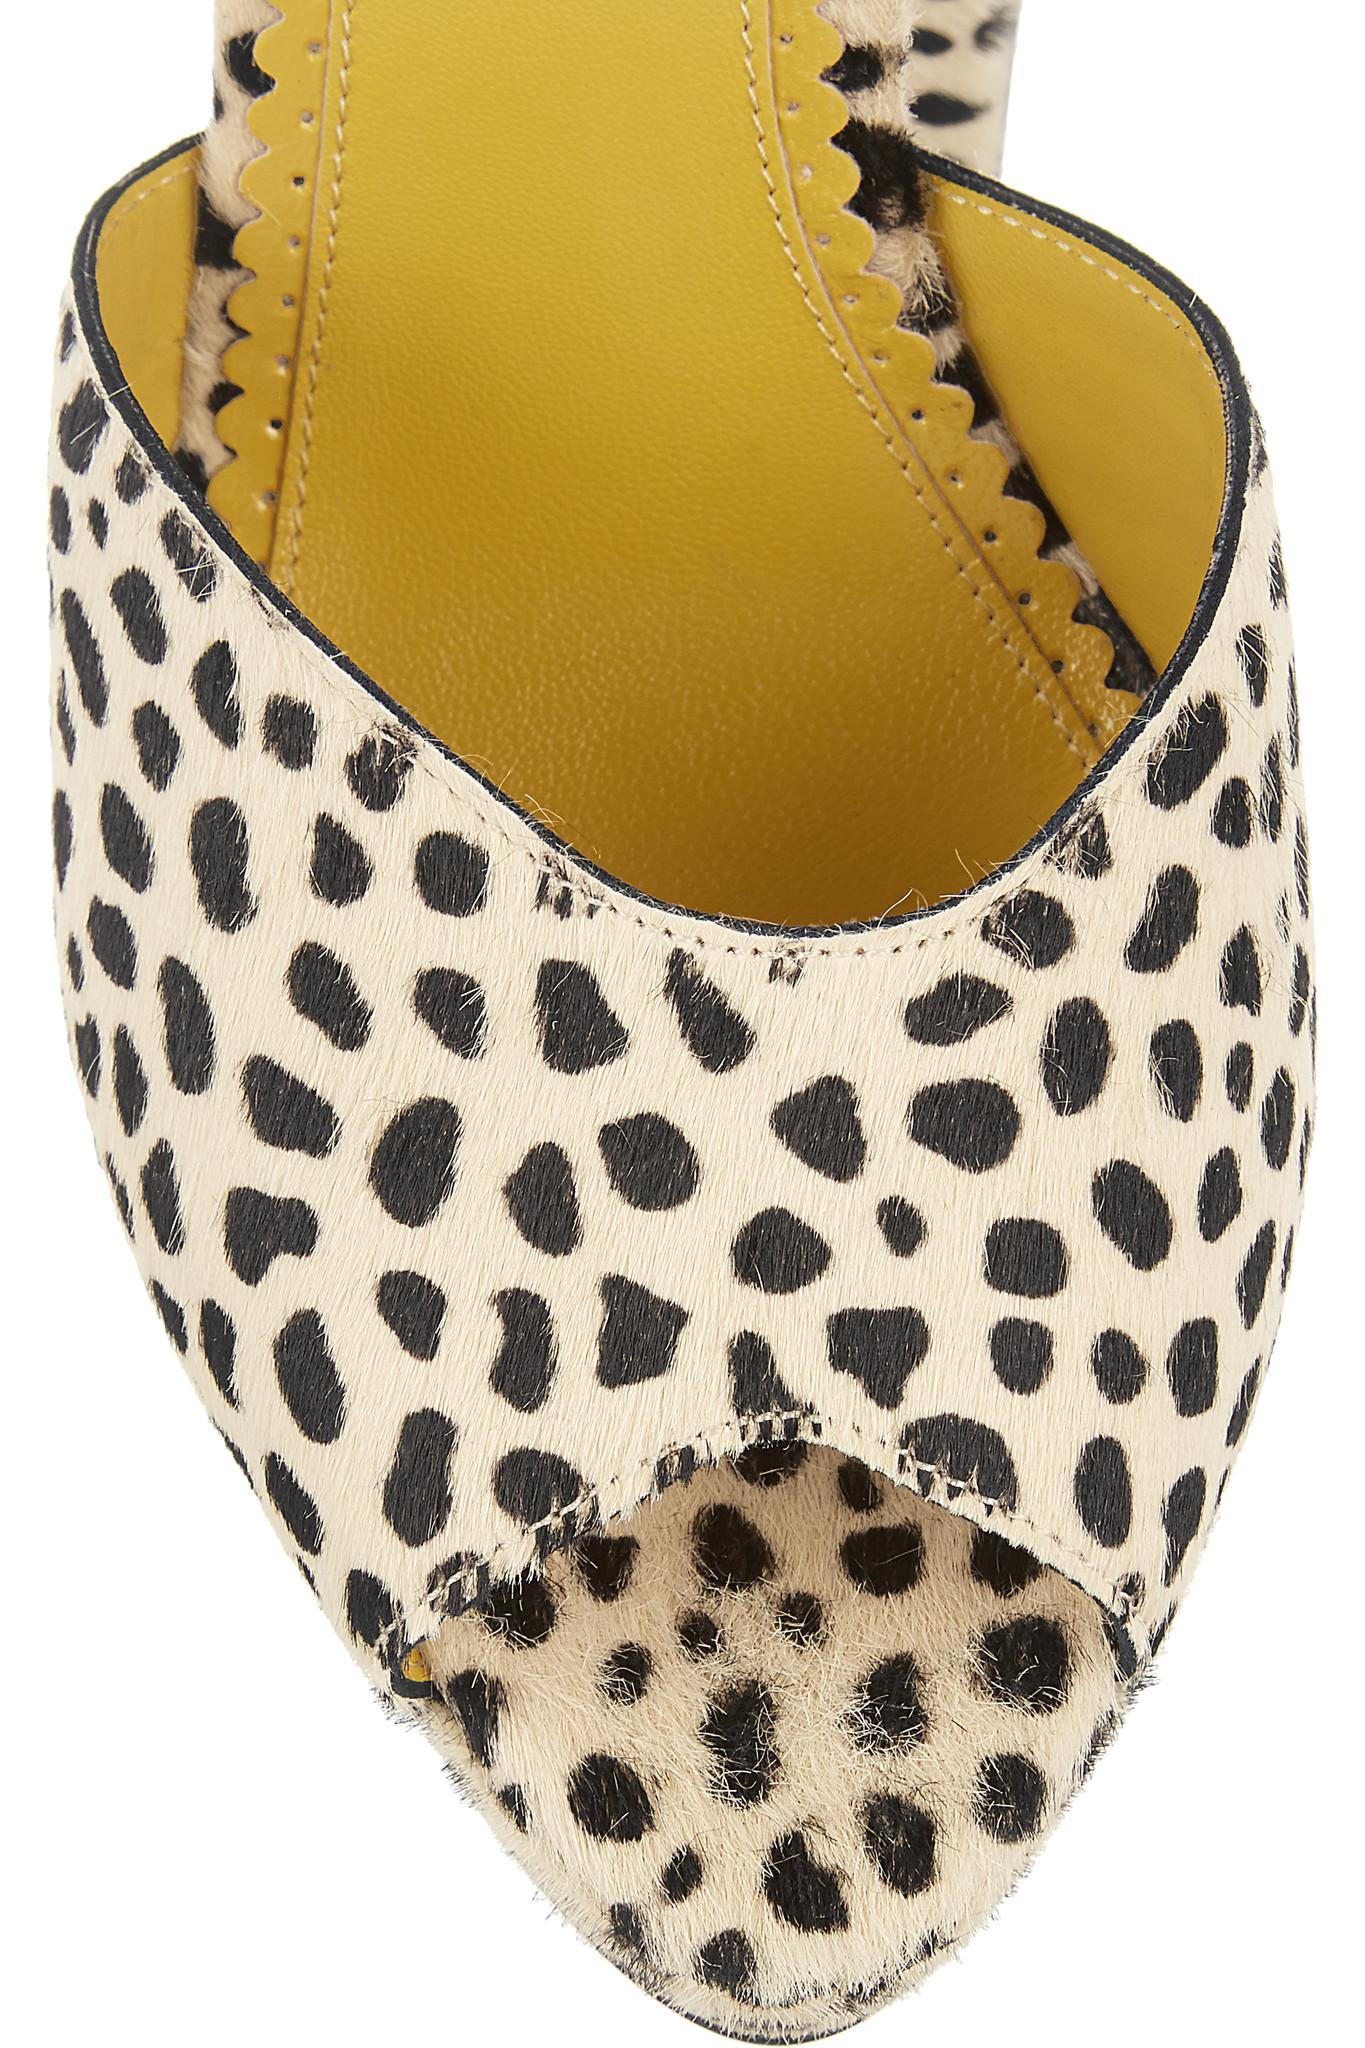 9e7f81b5120 Lyst - Charlotte Olympia Chantale Cheetah-print Calf Hair Platform ...